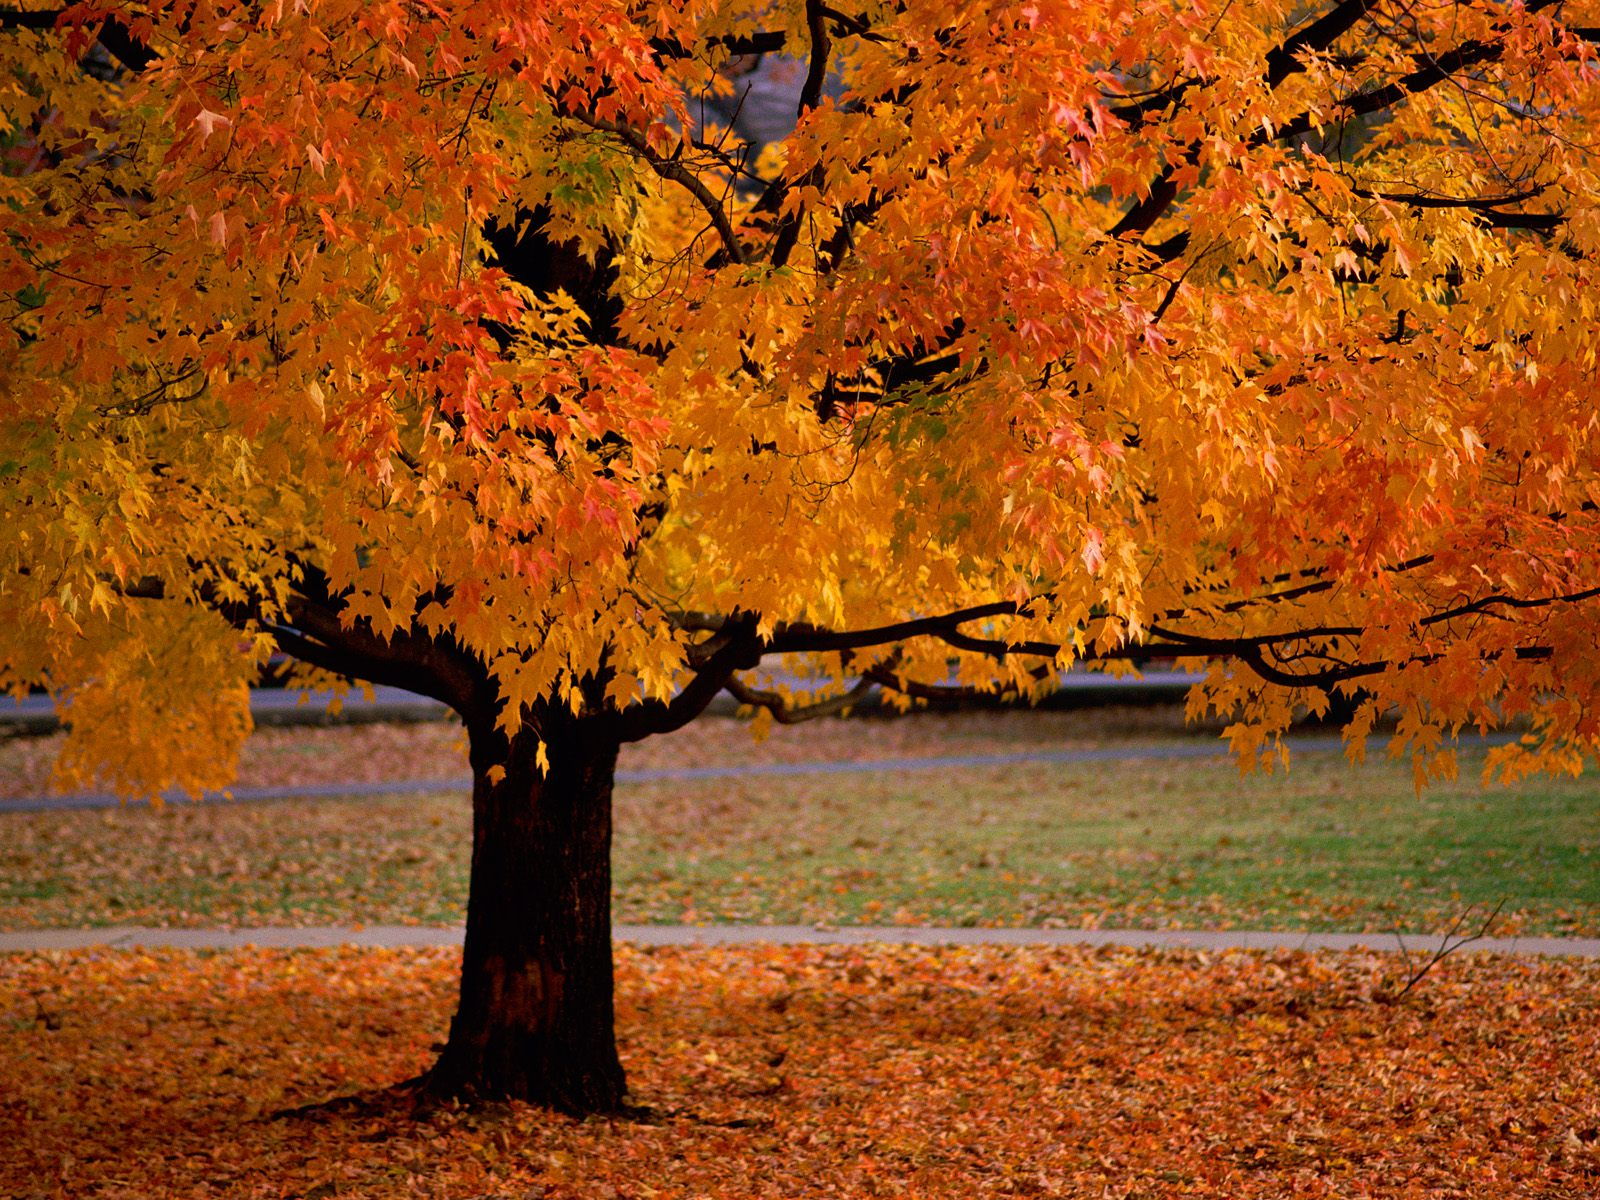 The best top autumn desktop wallpapers 35 En Güzel Sonbahar HD Duvar Kağıtları